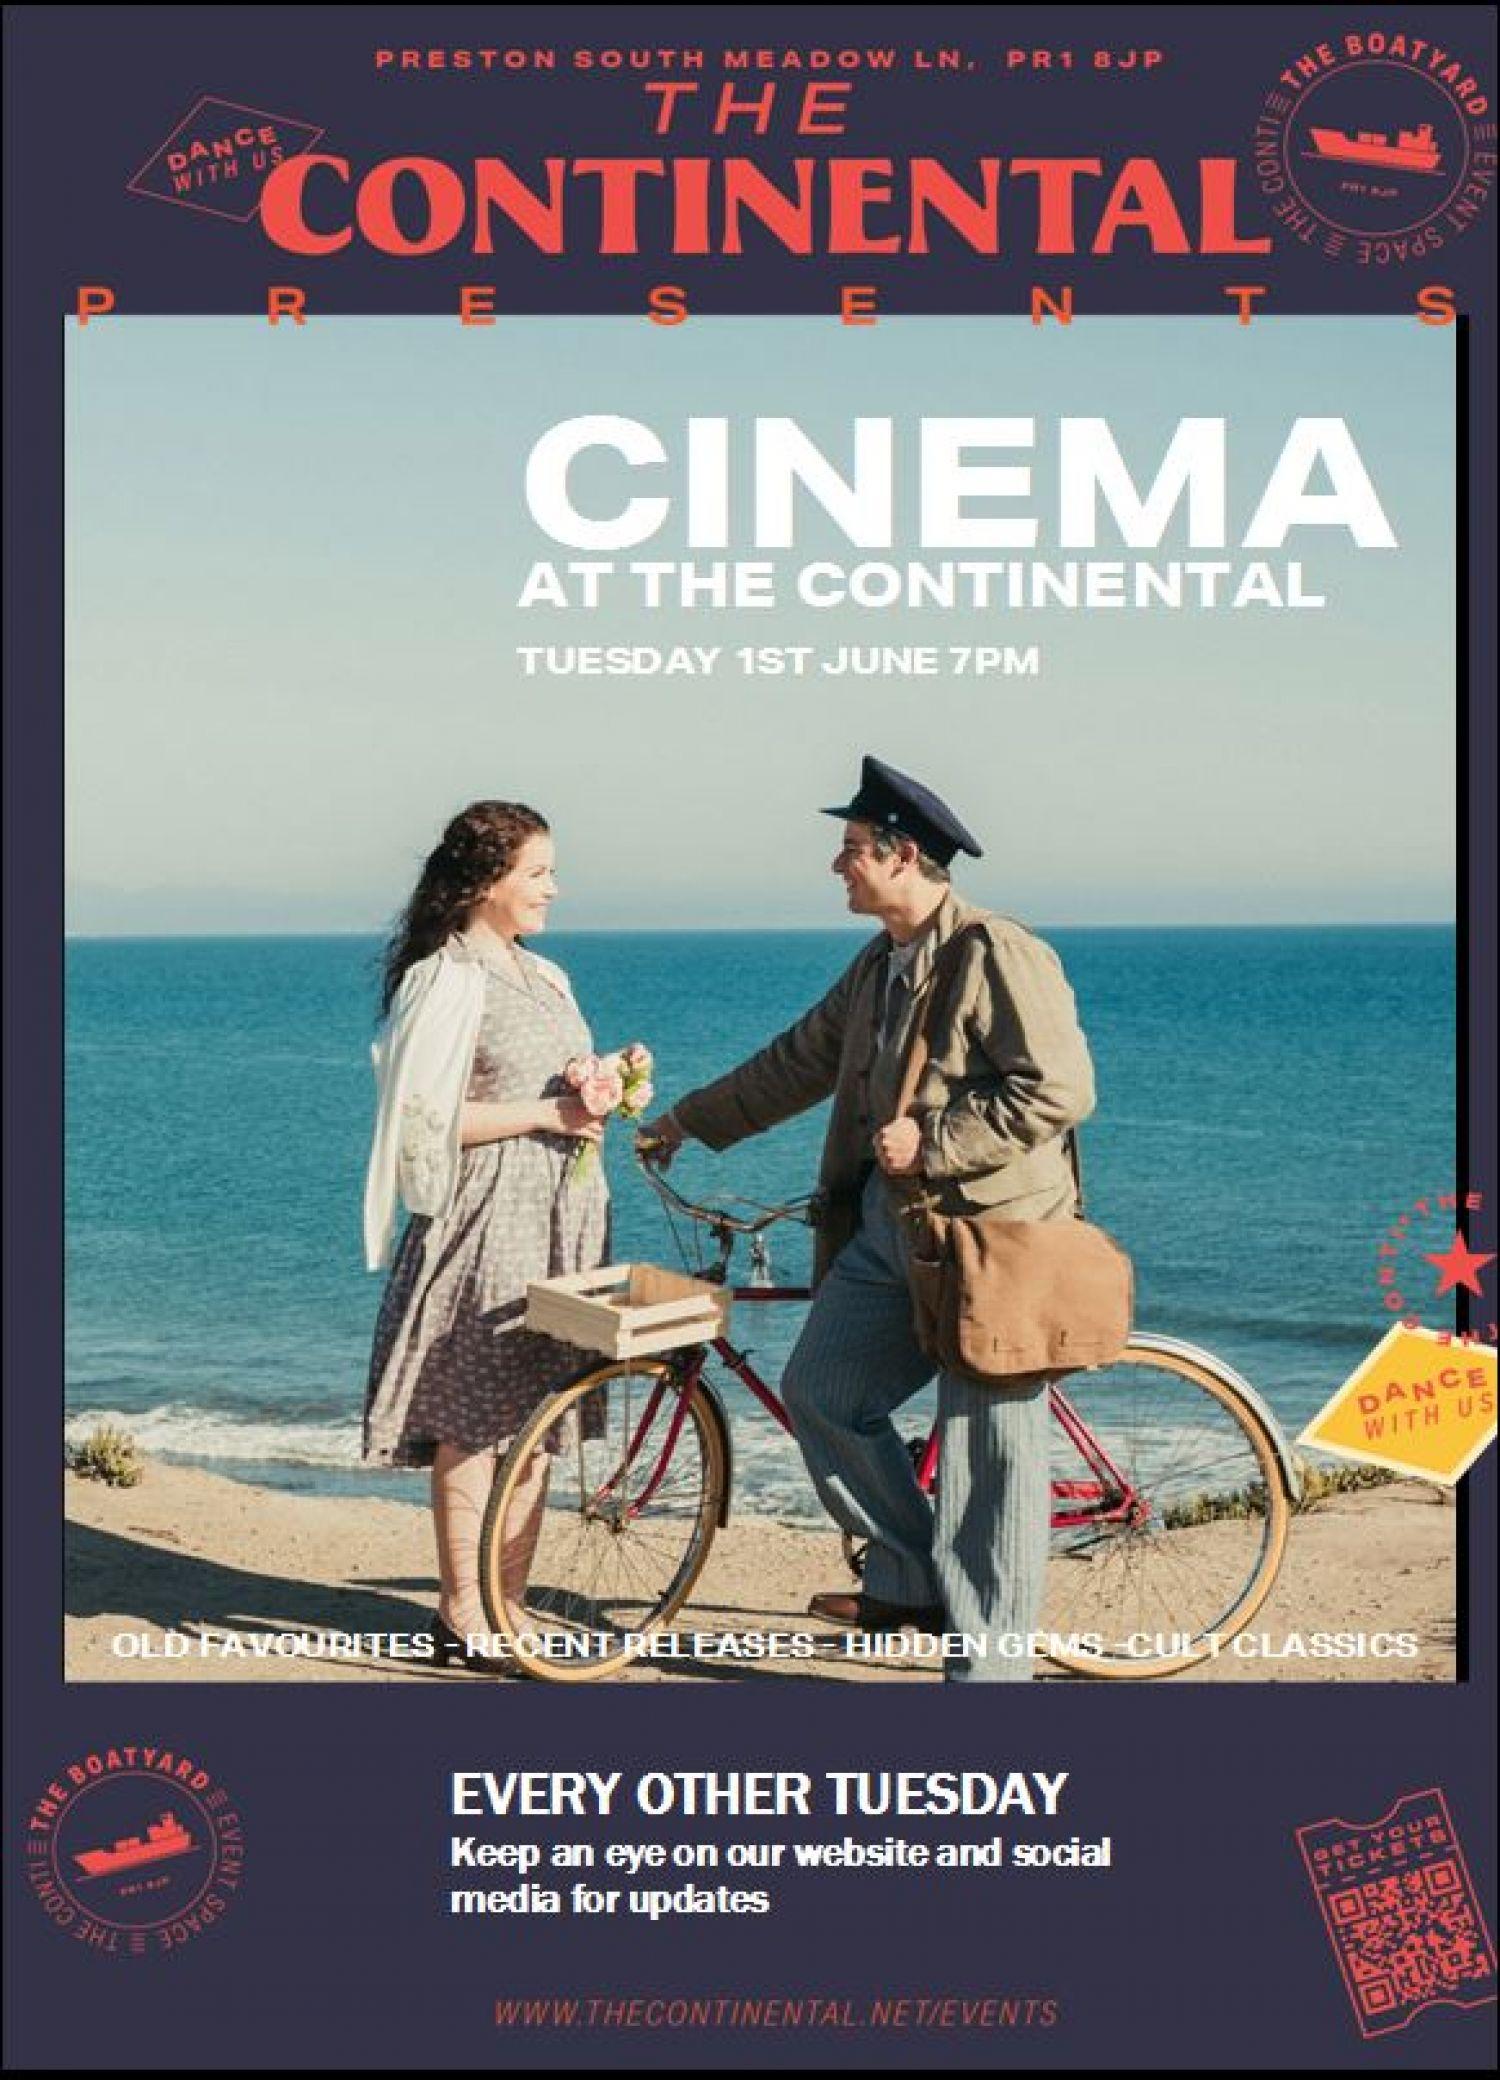 Cinema at The Continental